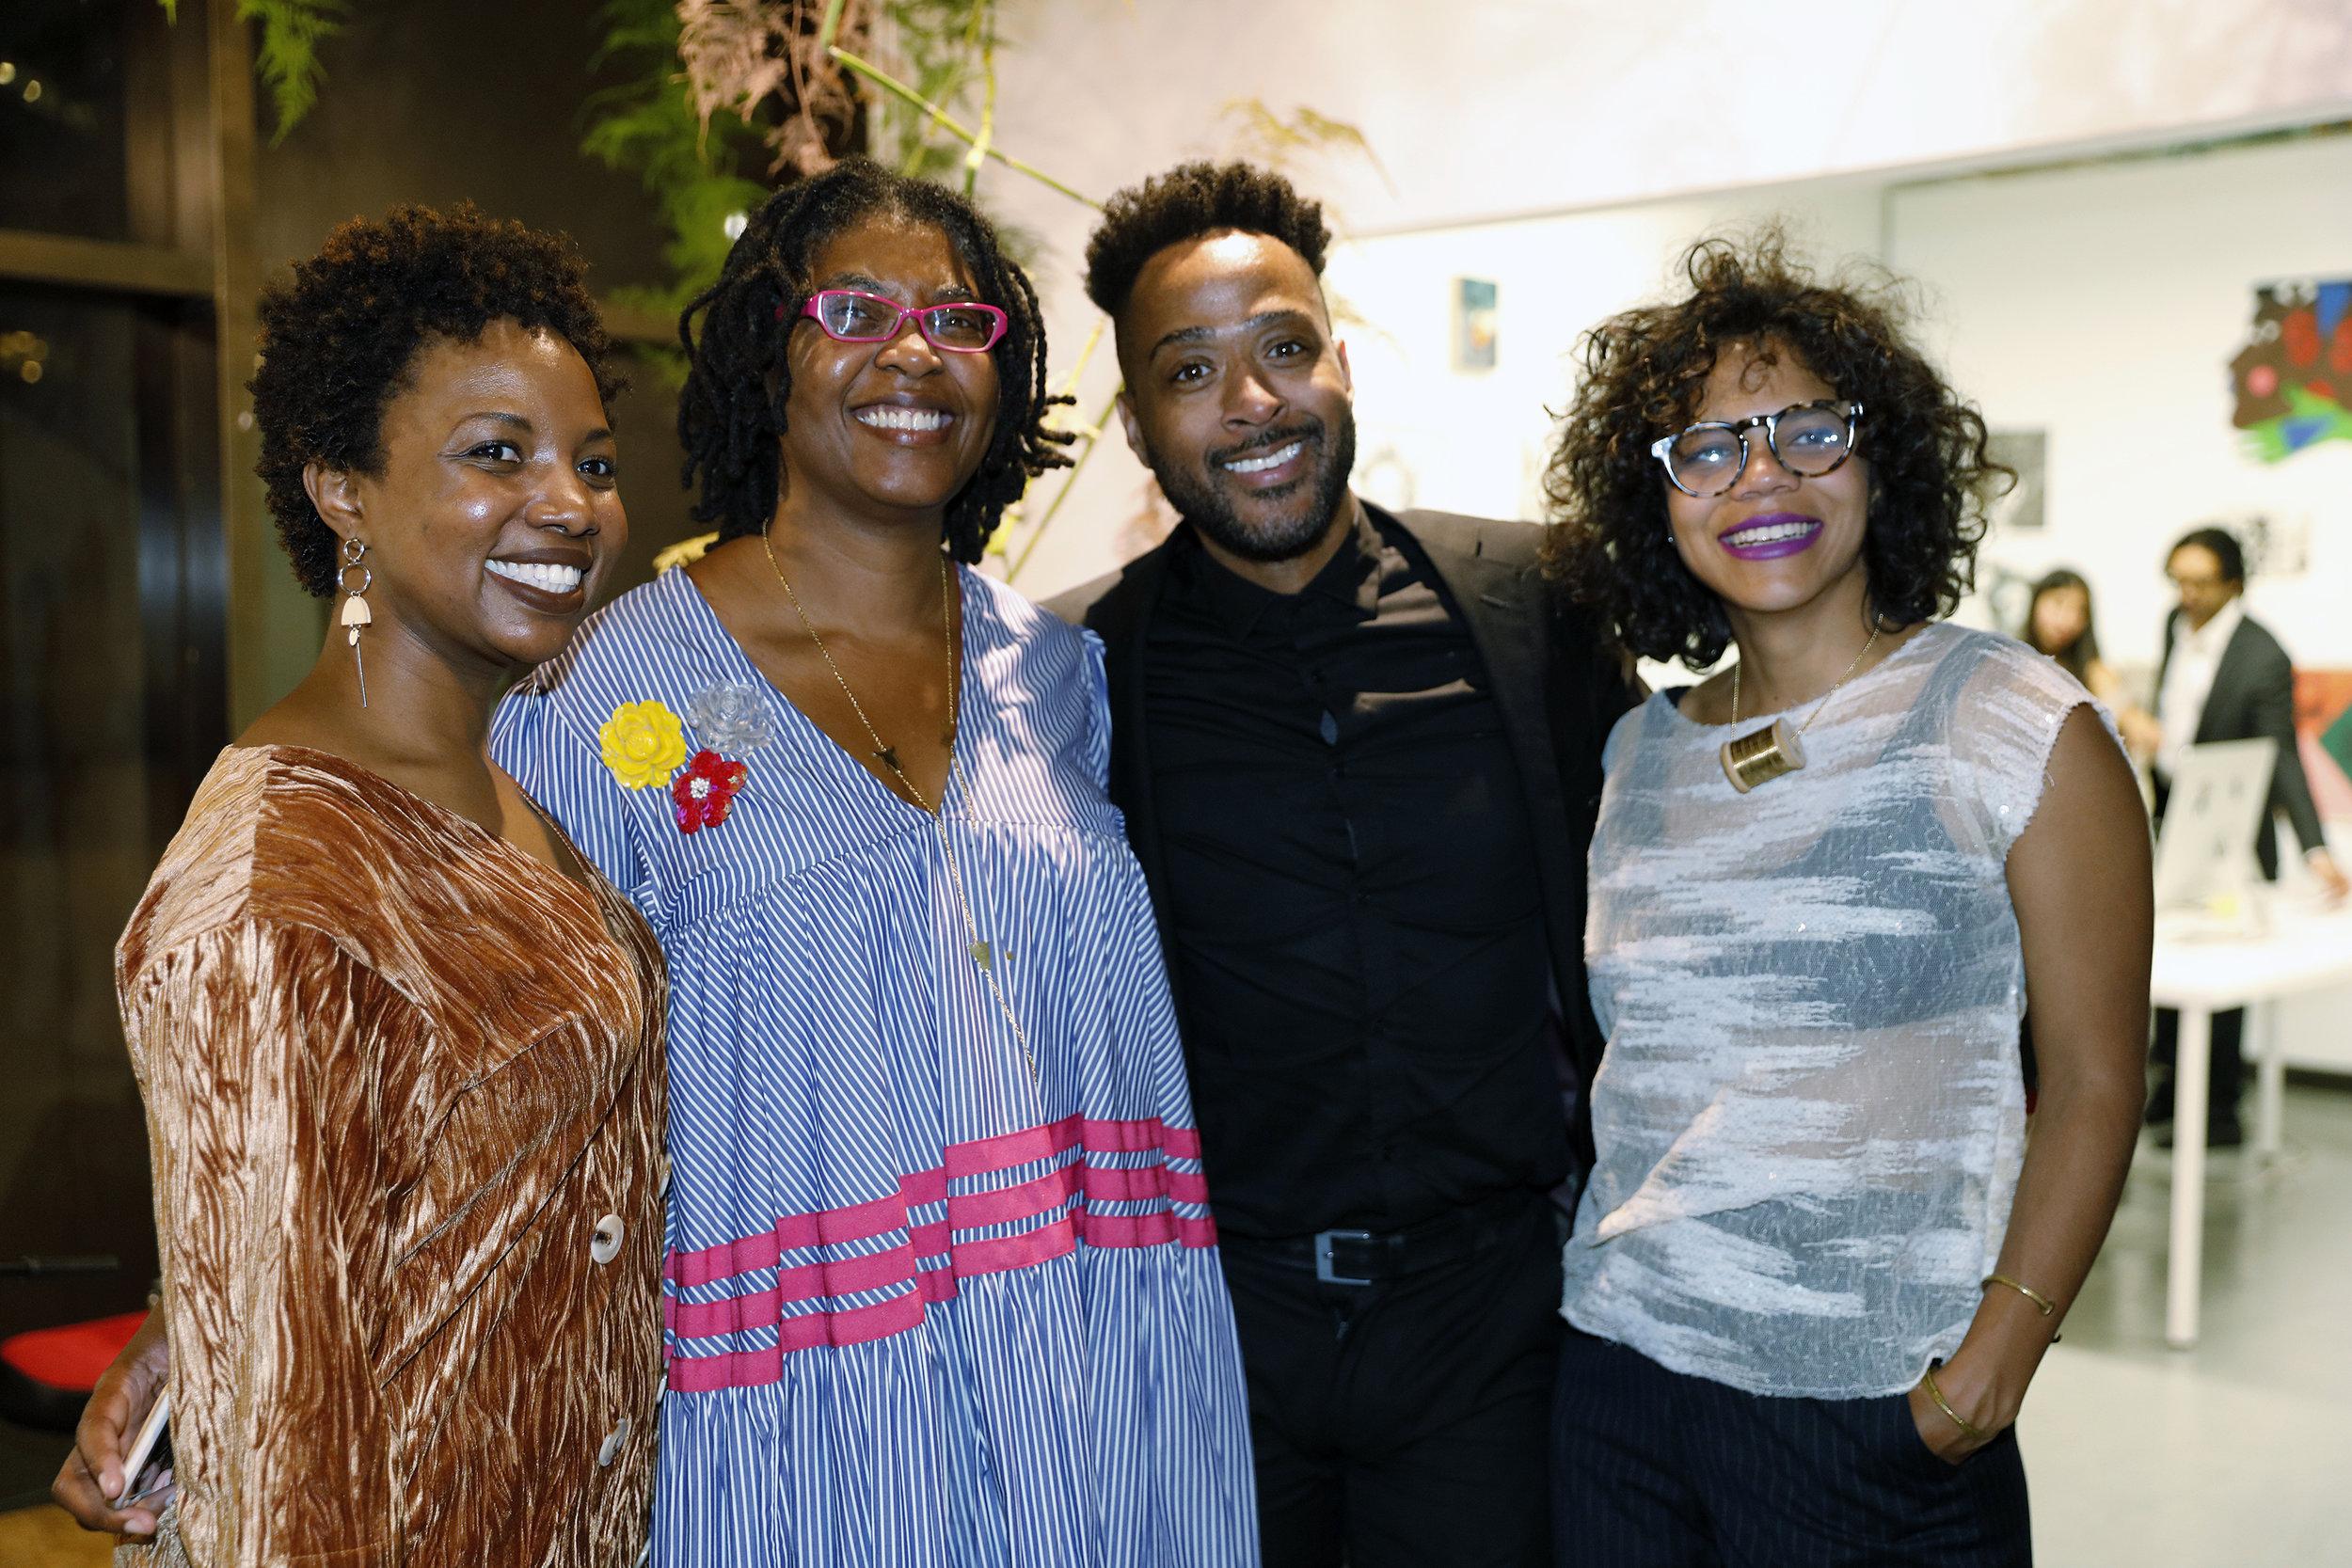 Ayesha Willams, BAWA honoree Kemi Ilesanmi, Curtis Young, Lizania Cruz. Photo by Anthony Alvarez.